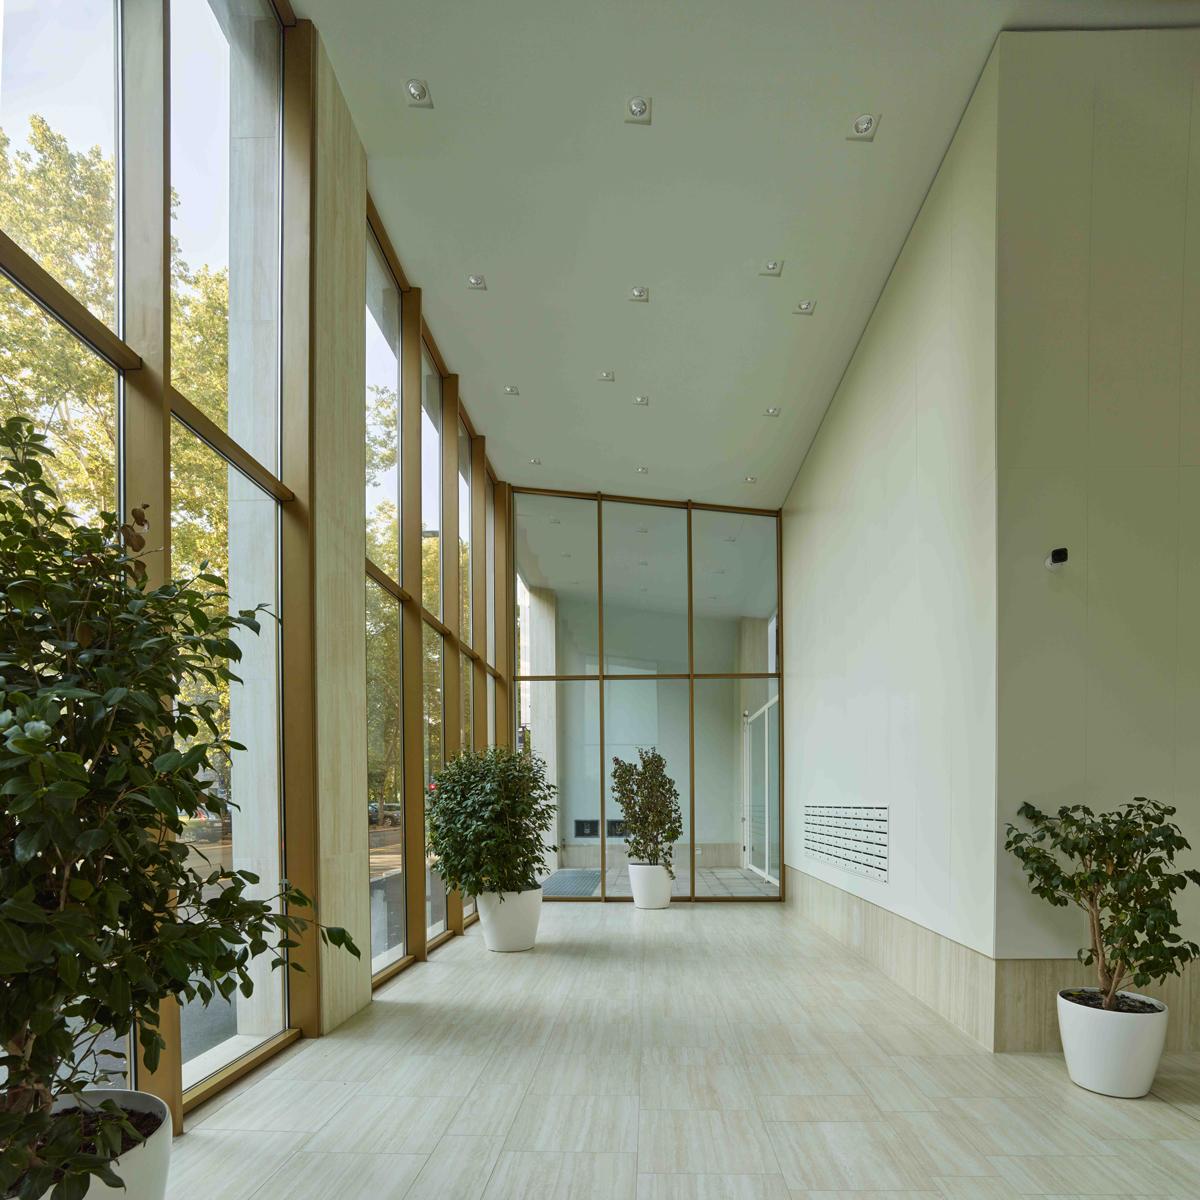 Degli-Esposti-Architetti-Milan-Casa-Selene-06